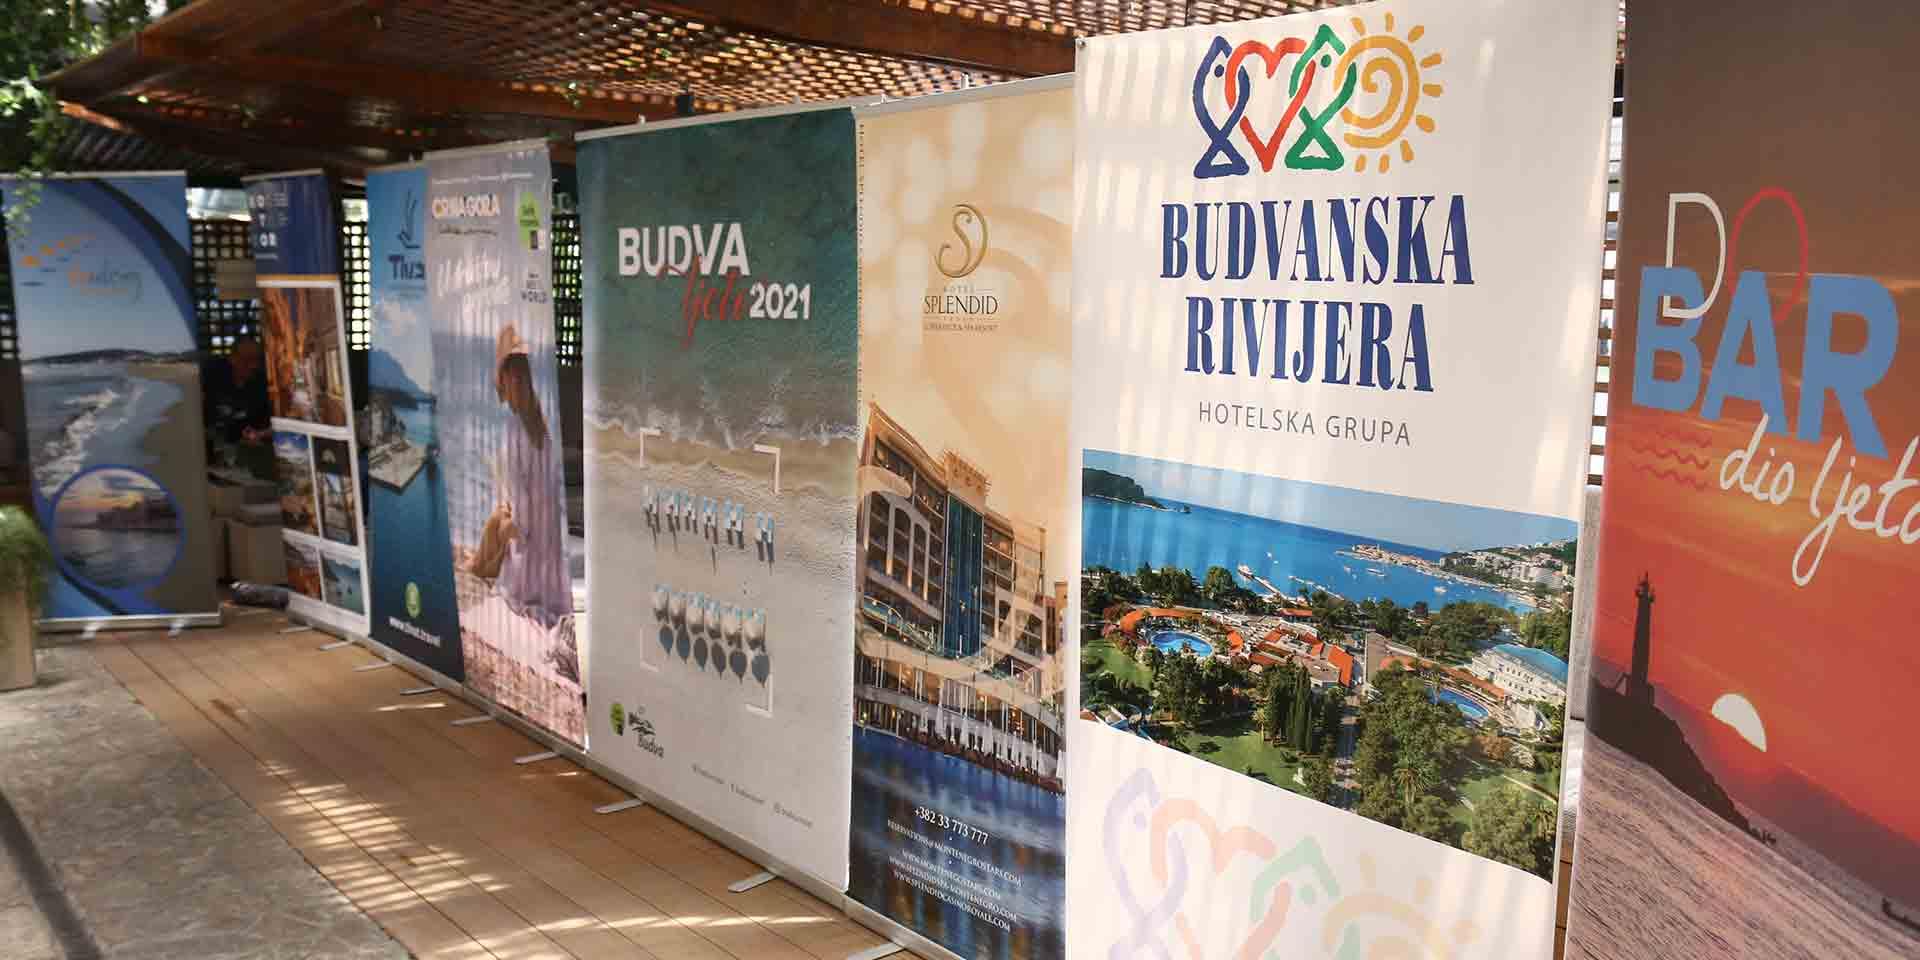 budva-events budva-activities beach budva-yacht budva-restaurants